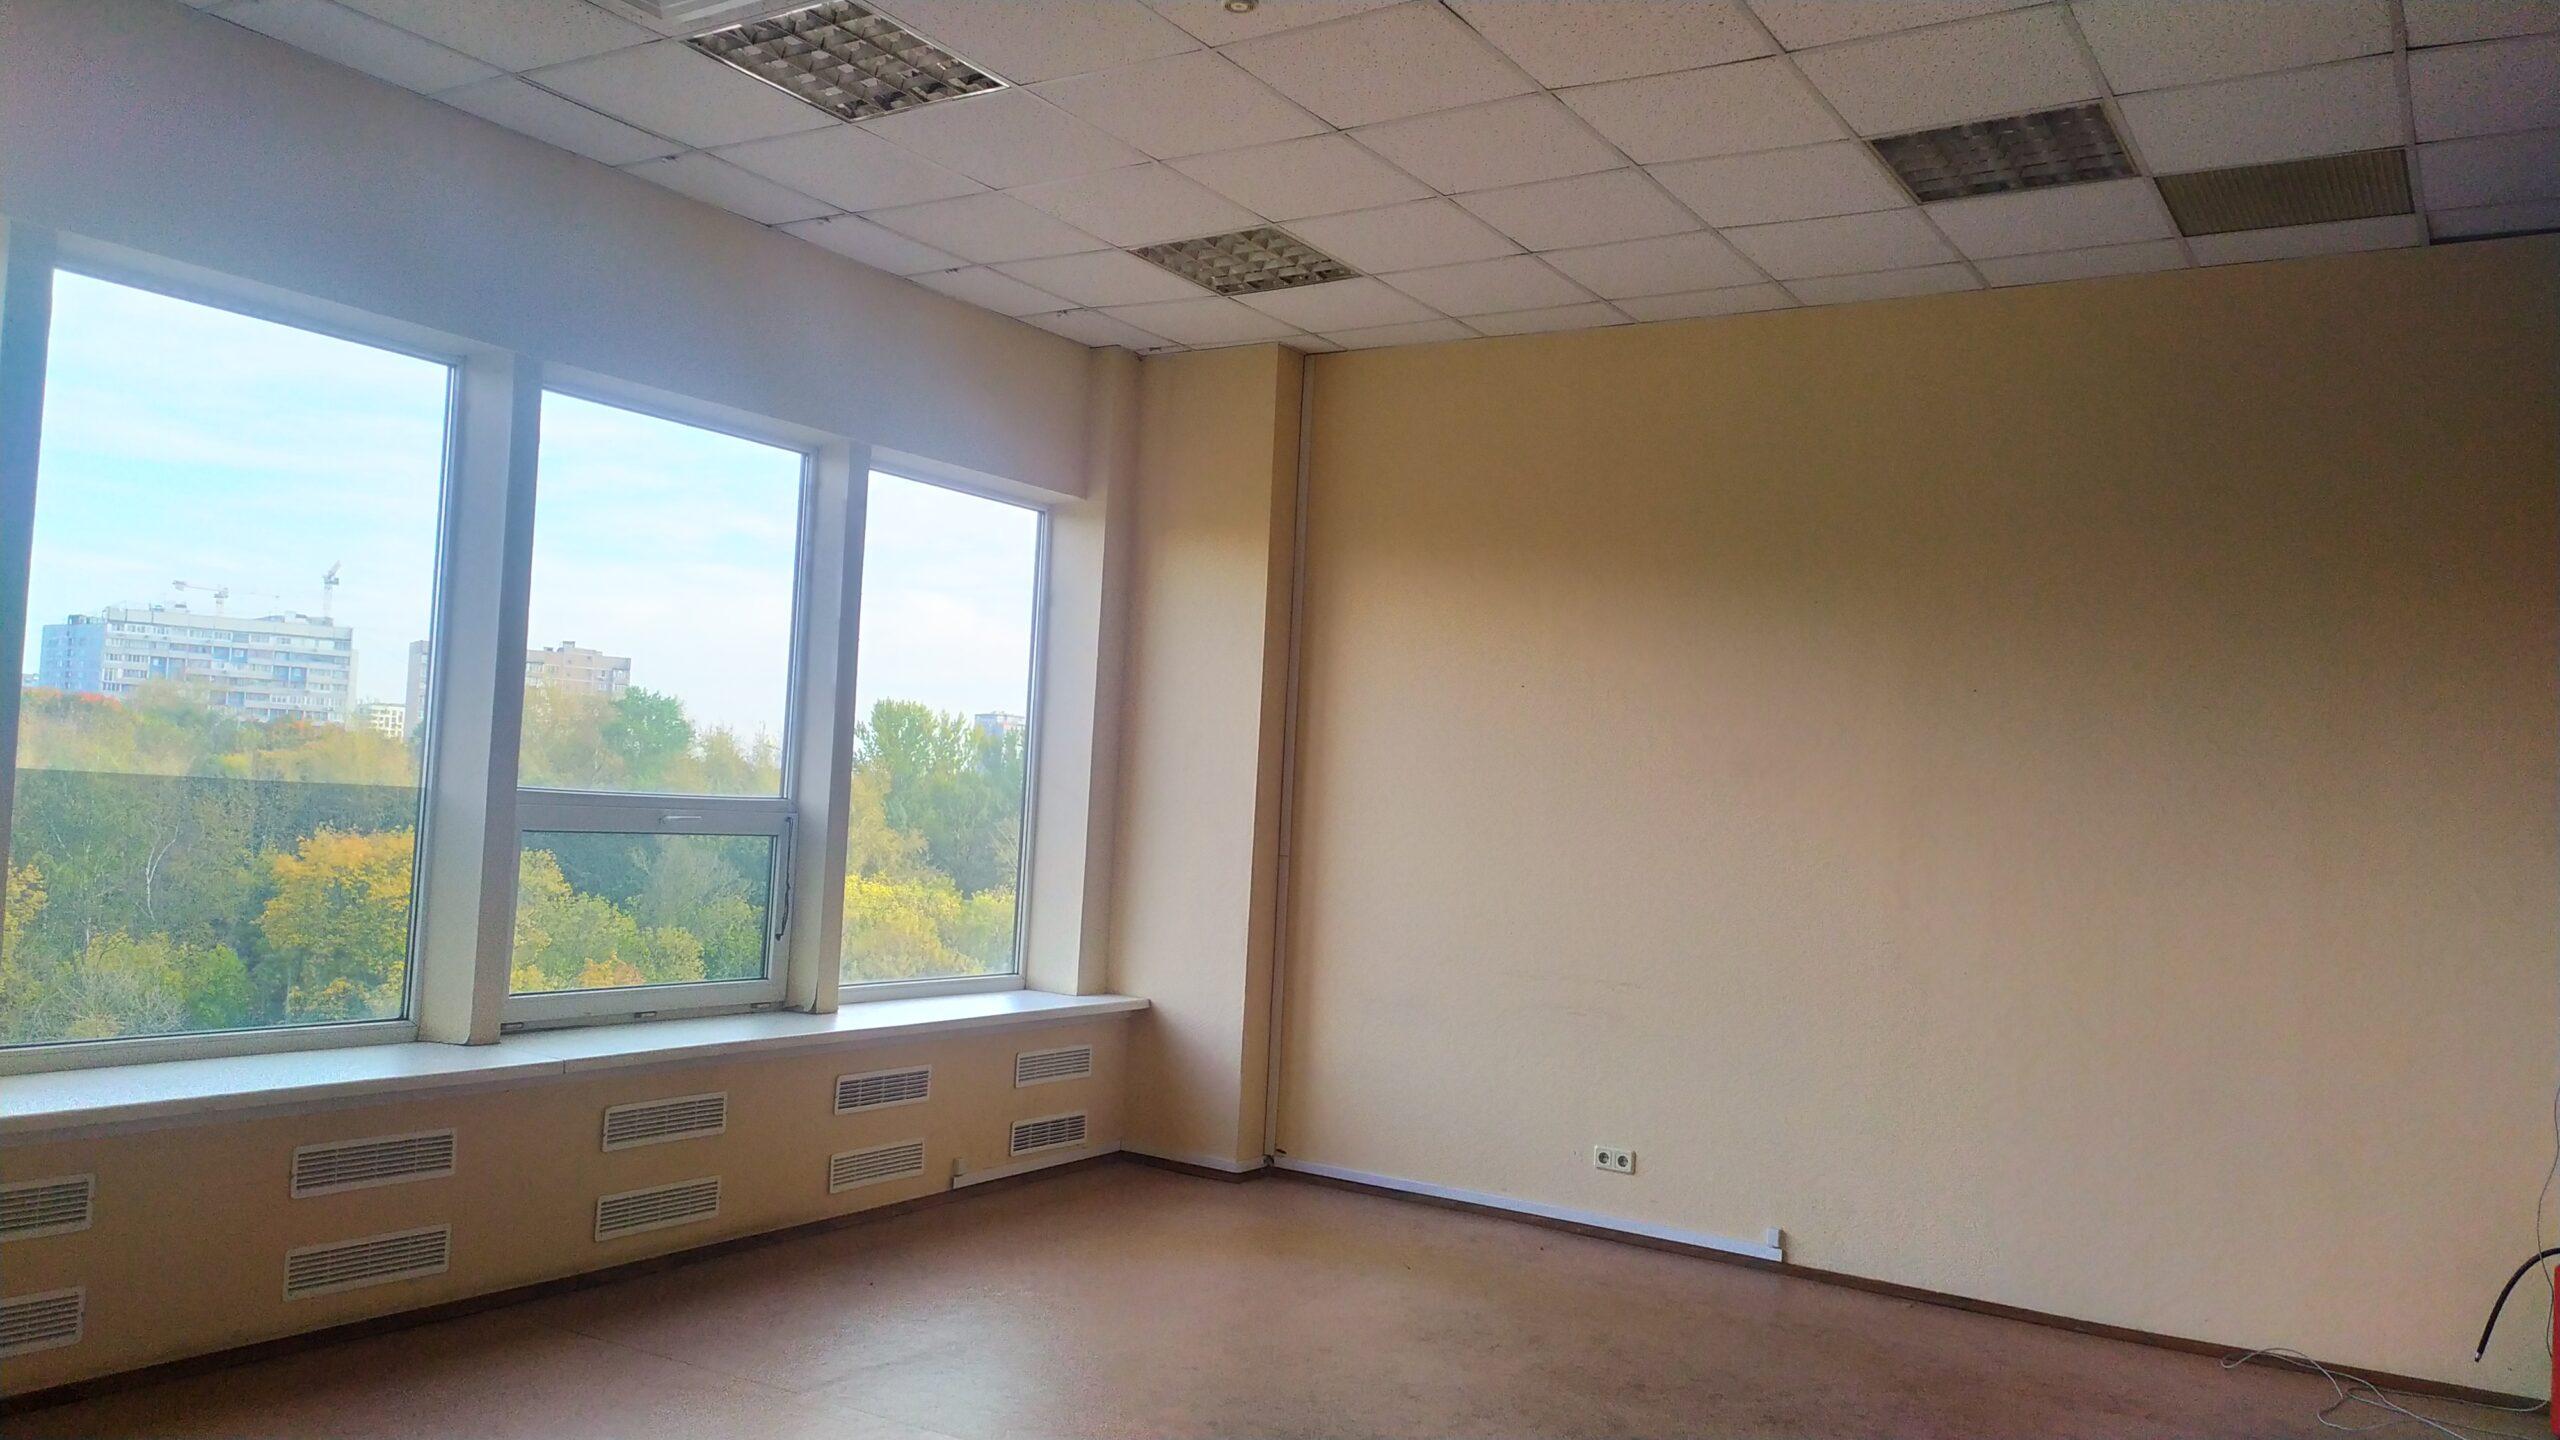 Аренда офиса в Москве рядом с метро